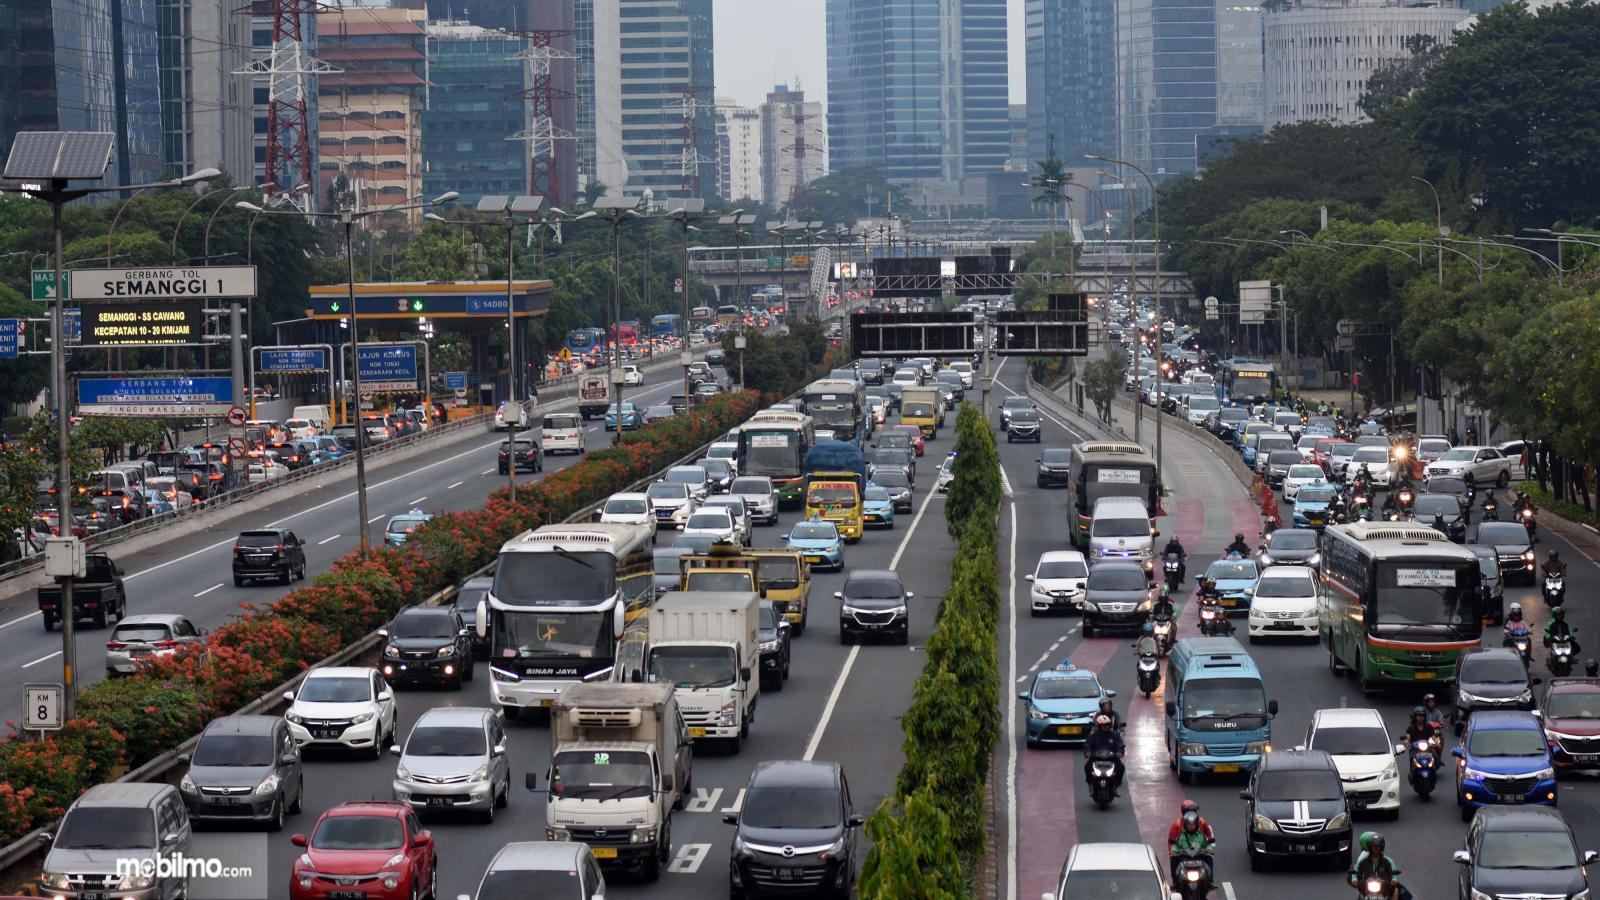 Foto menunjukkan suasana kemacetan di salah satu ruas jalan ibu kota